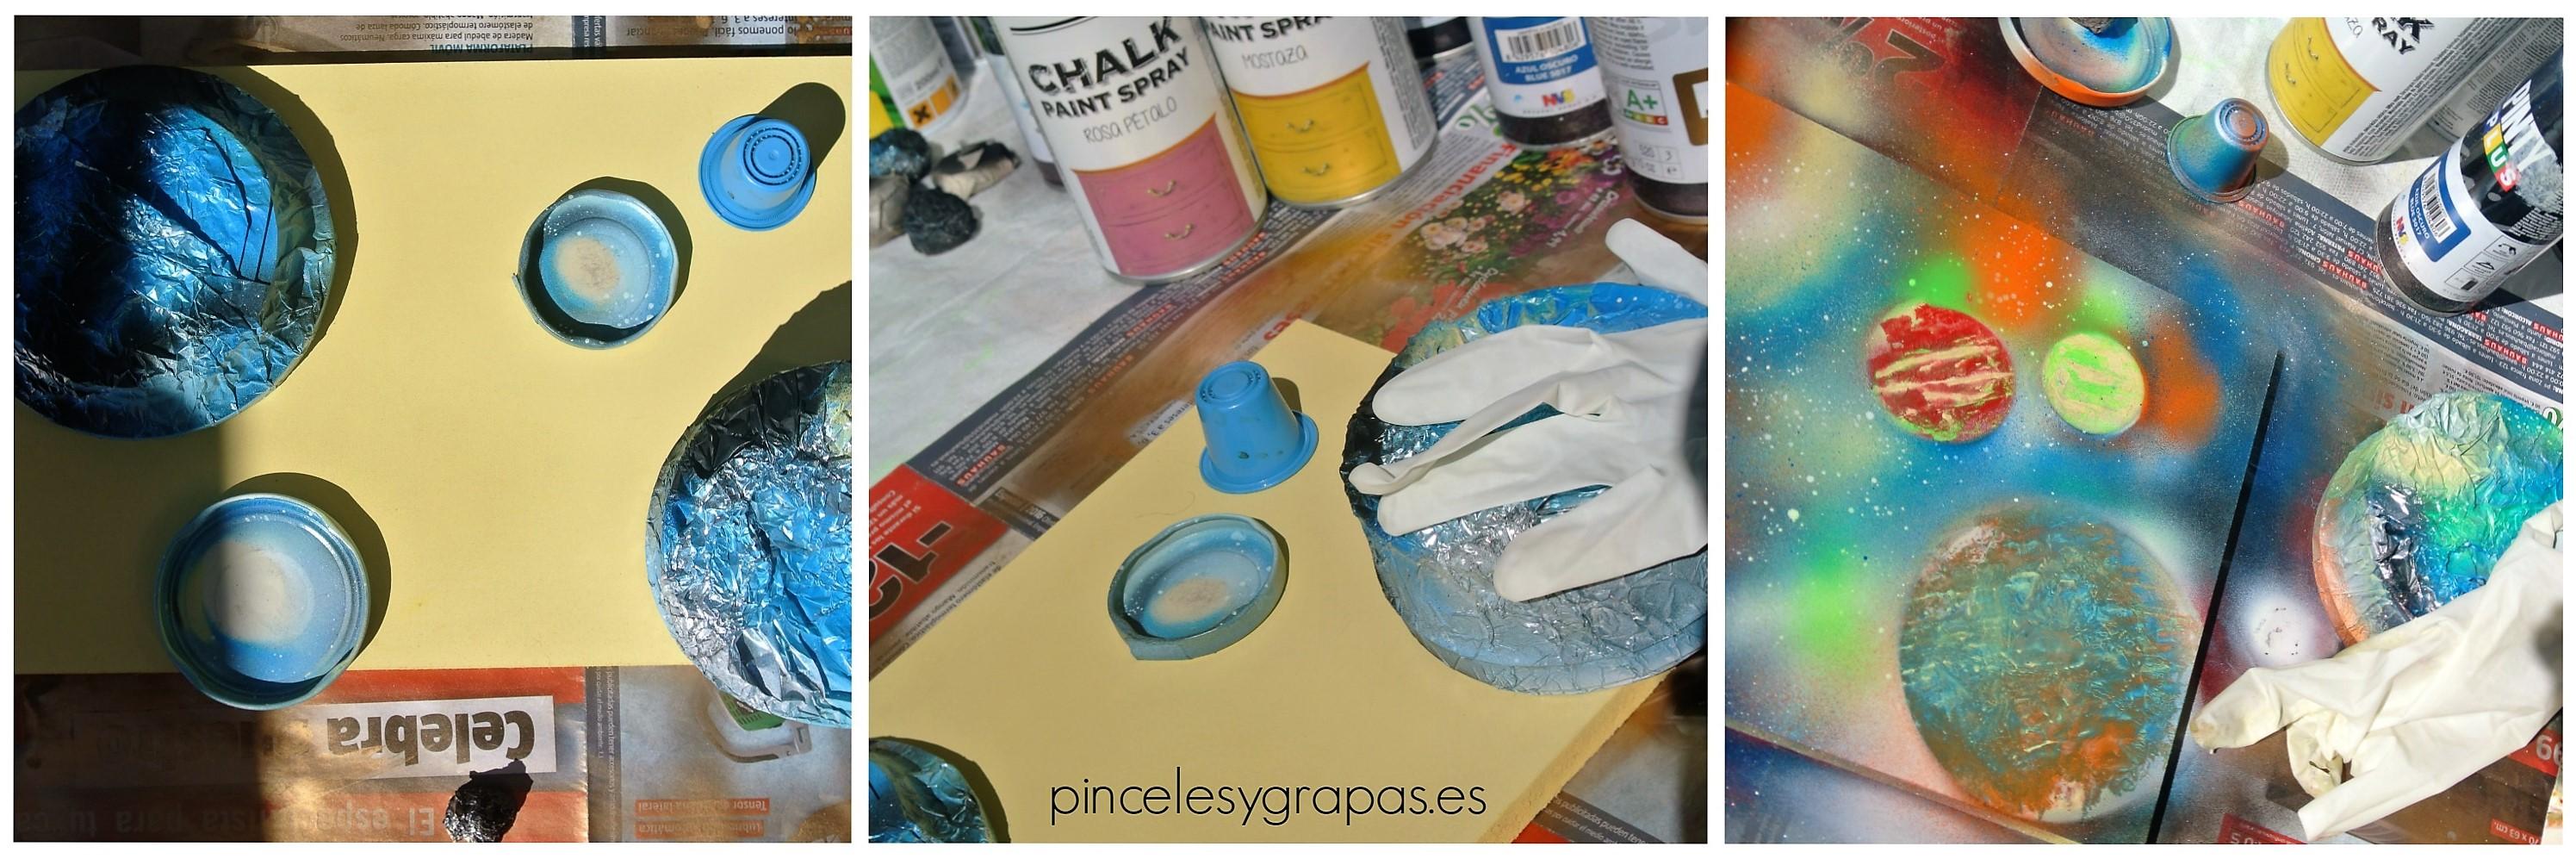 pinceles_y_grapas_planetas_sprays_pasos1